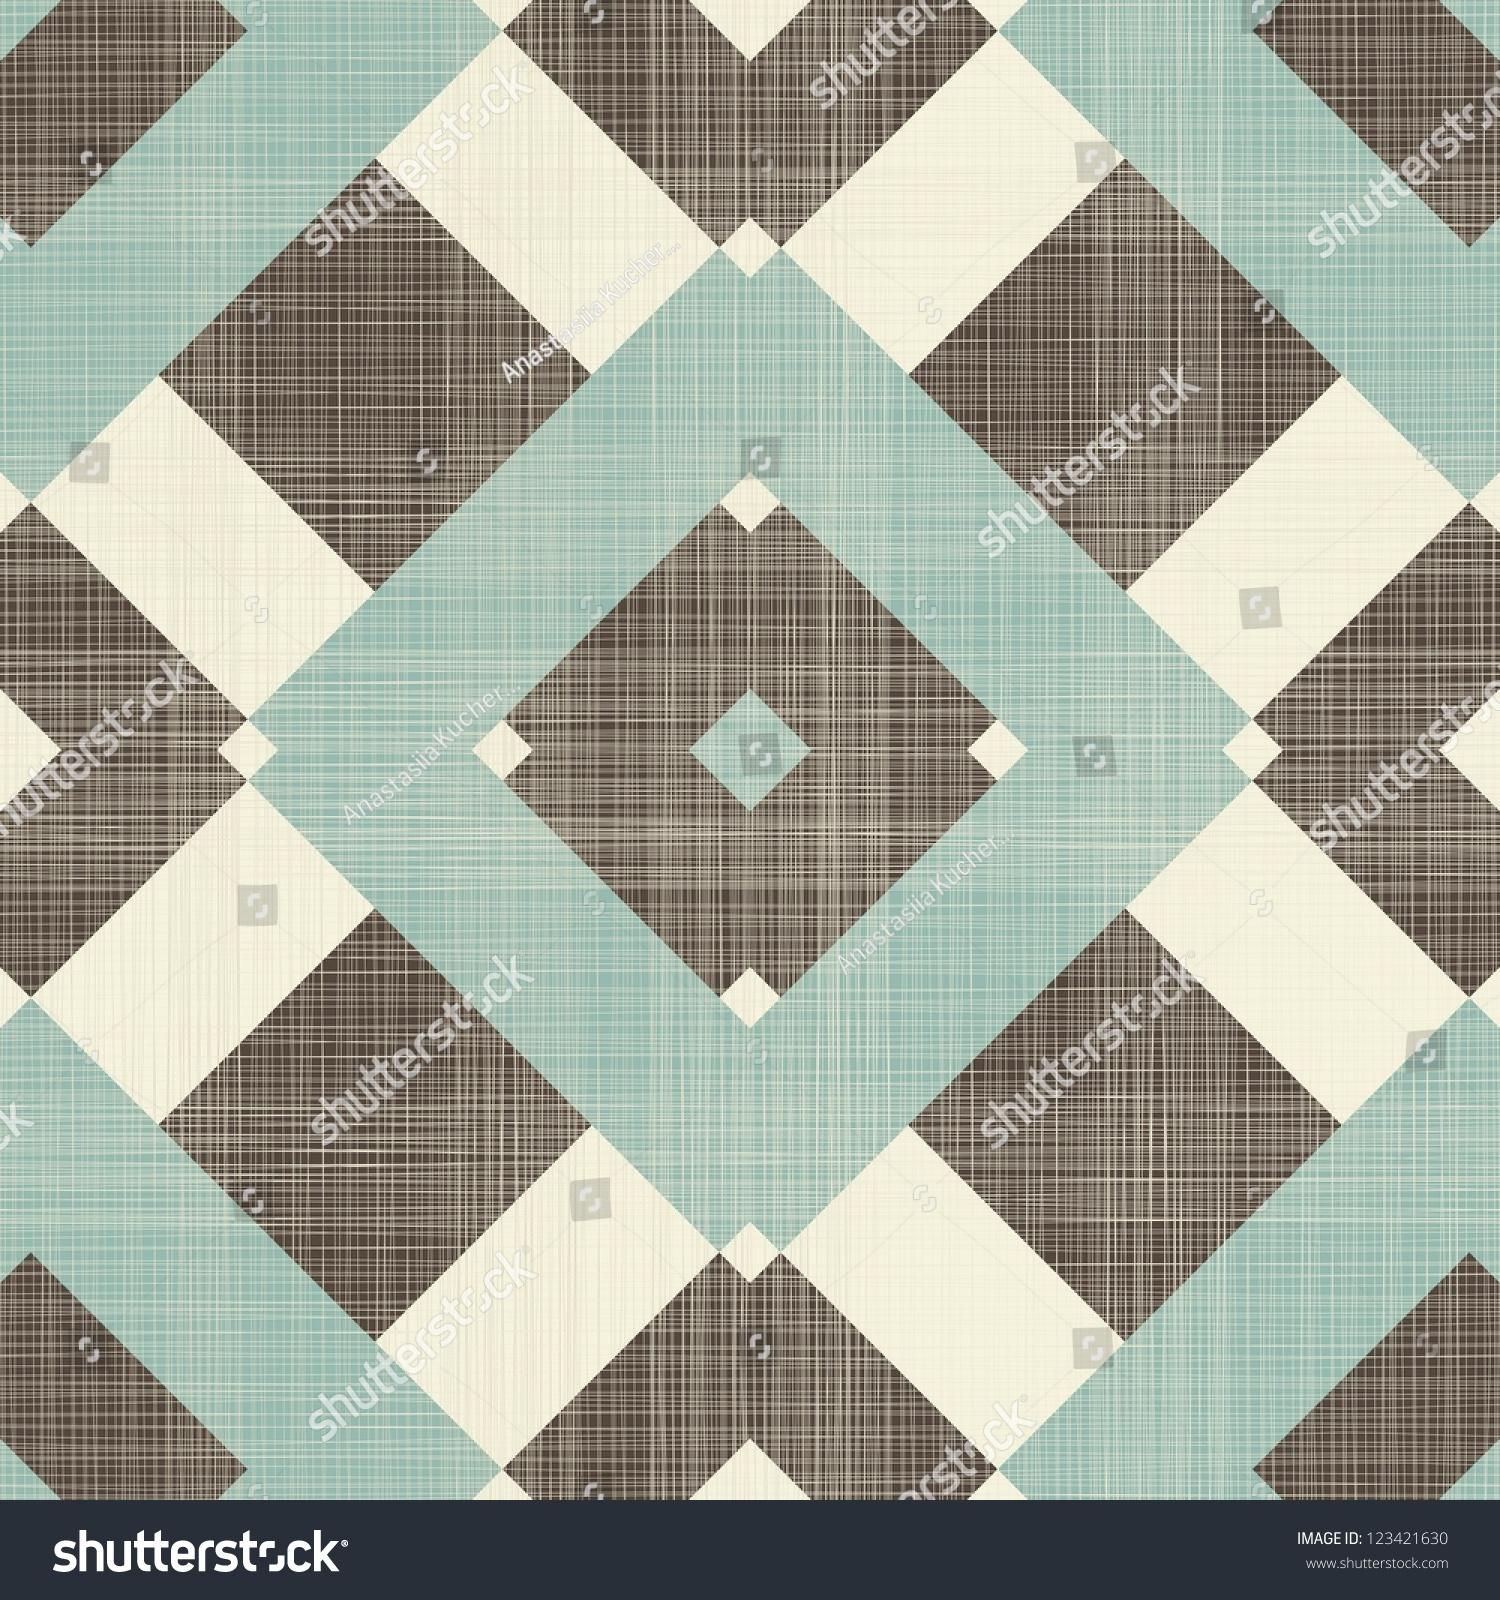 Retro geometric seamless pattern fabric texture stock for Object pool design pattern